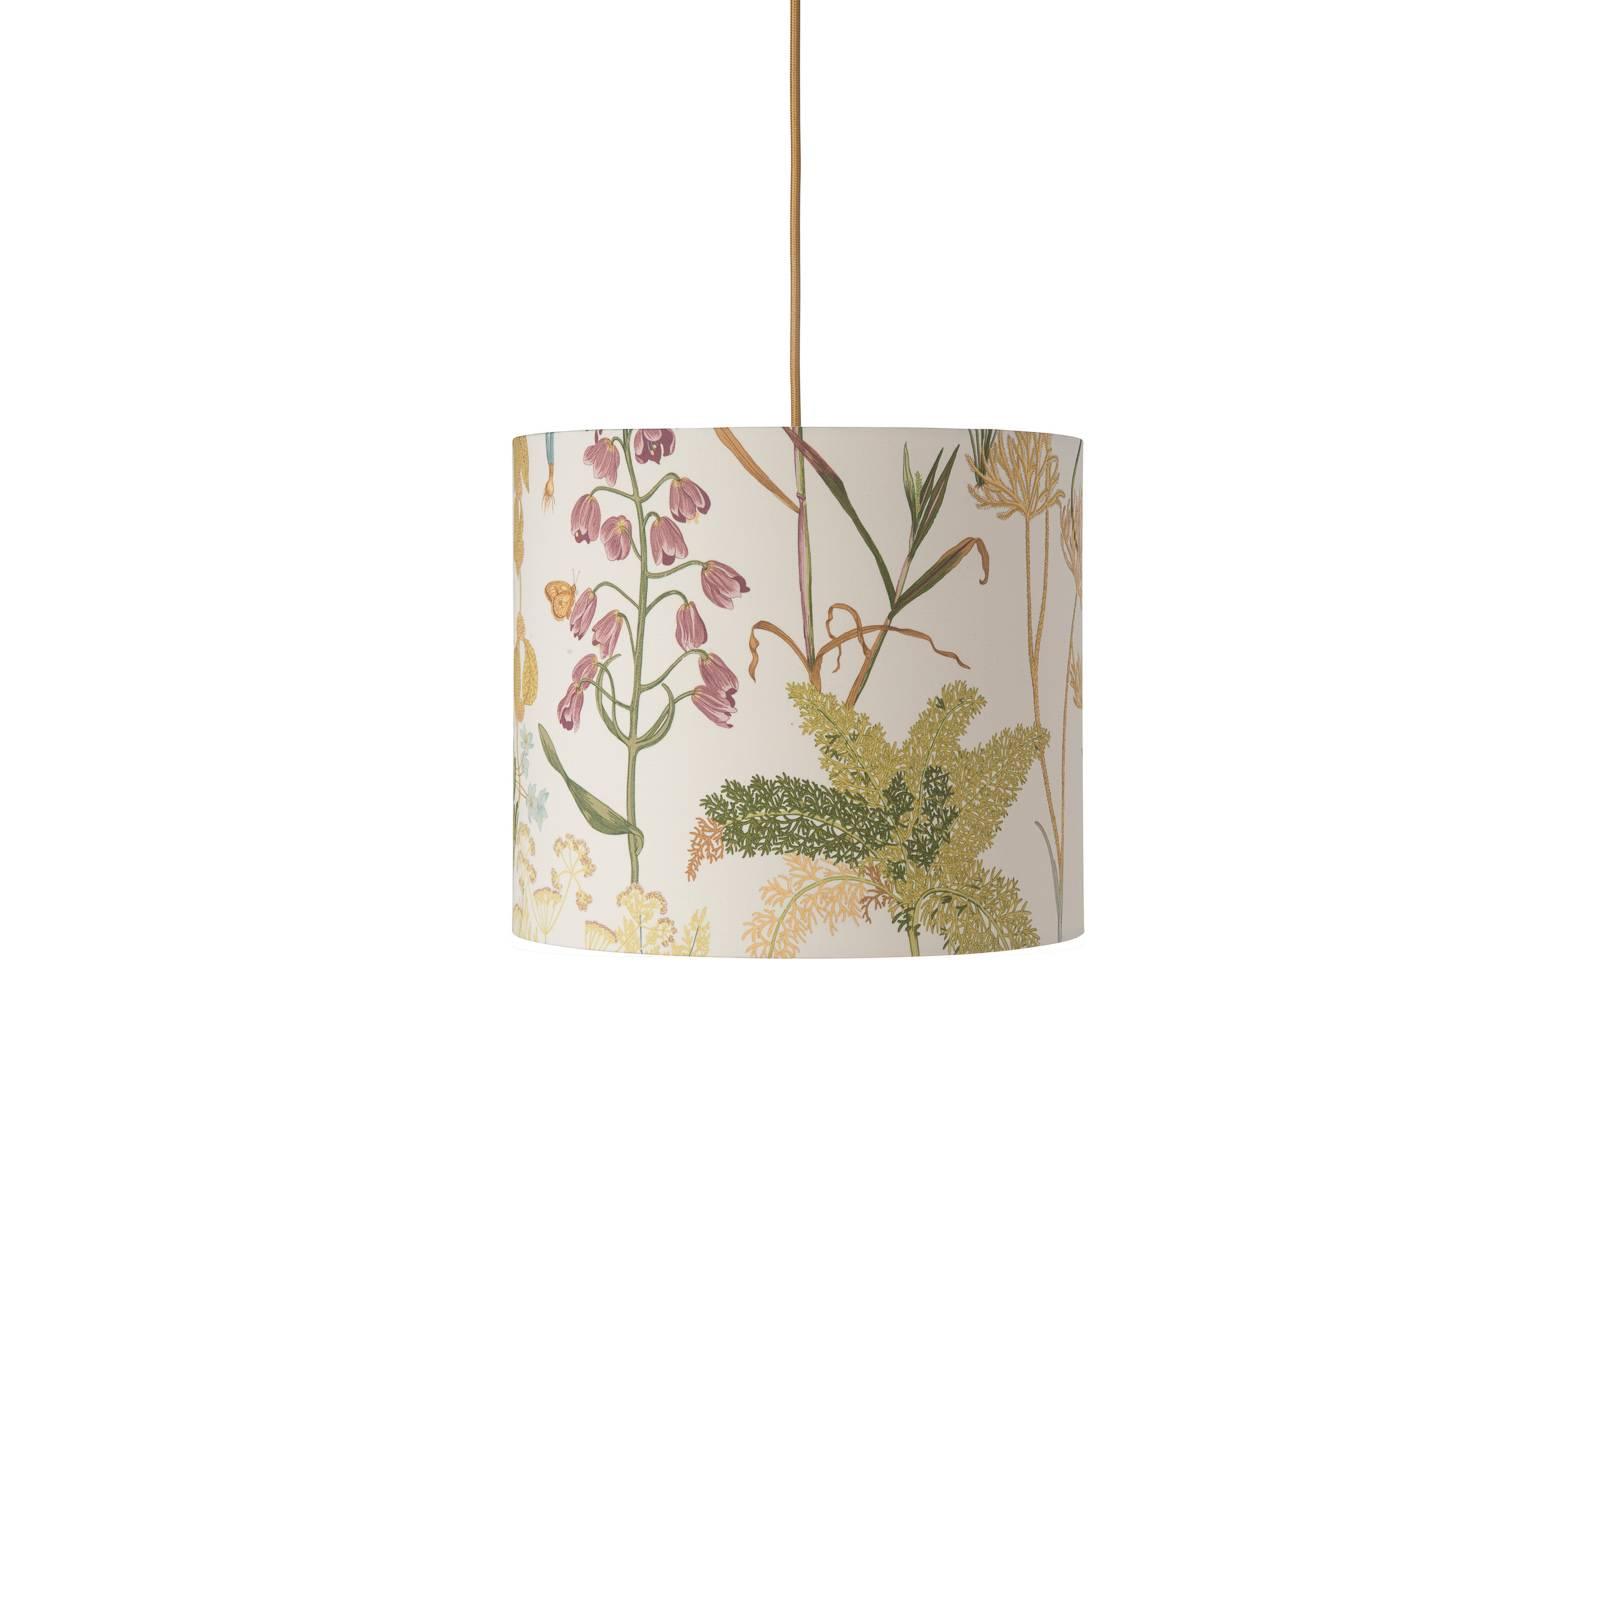 EBB & FLOW Botanical sospesa 30cm cavo rotondo/oro